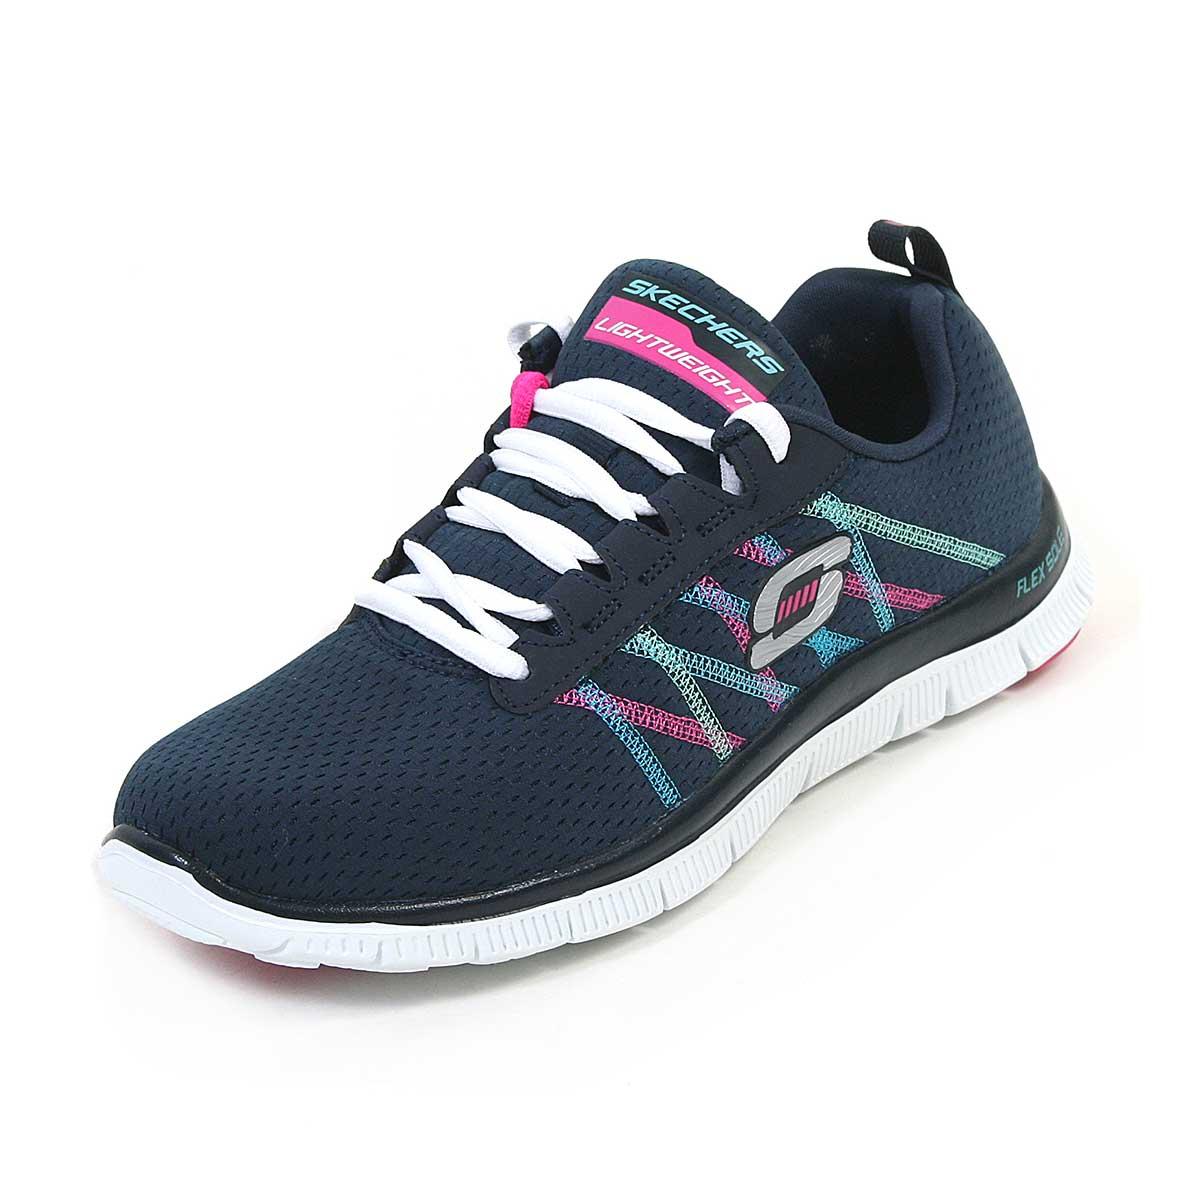 Buy Skechers Flex Appeal womens Running Shoes Online India 92d14c728